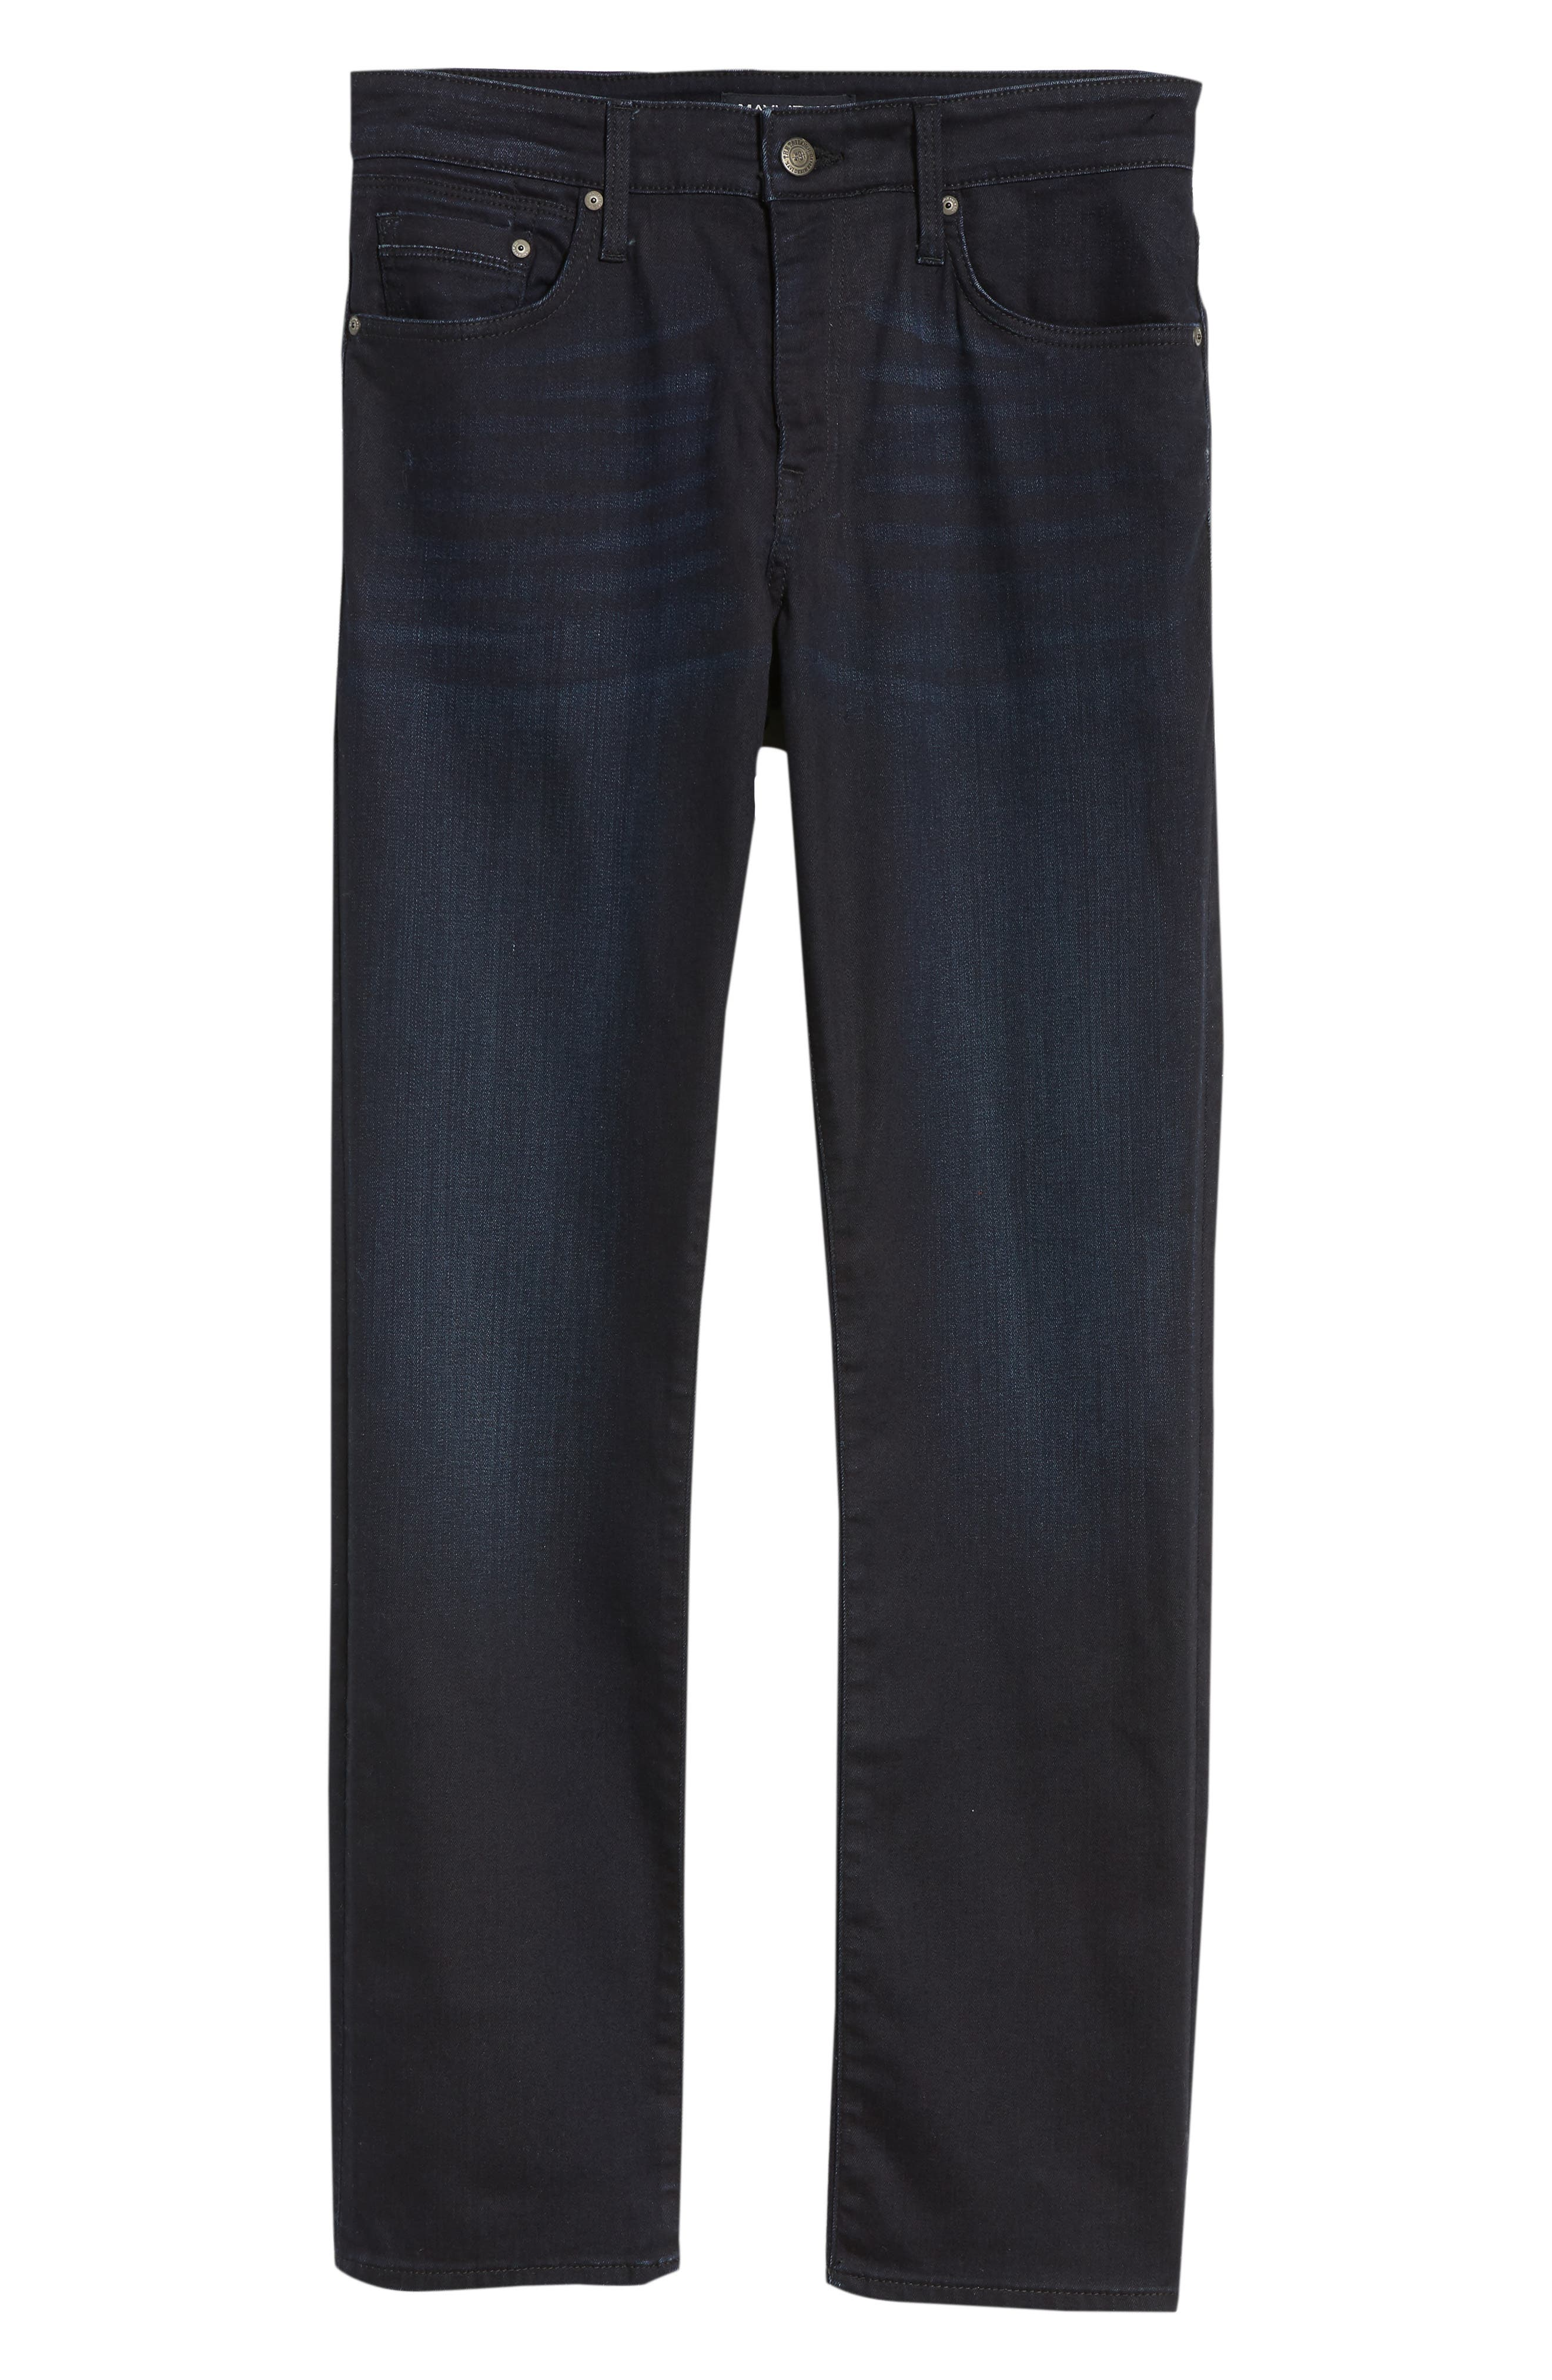 Matt Relaxed Fit Jeans,                             Alternate thumbnail 6, color,                             DEEP CAPITOL HILL